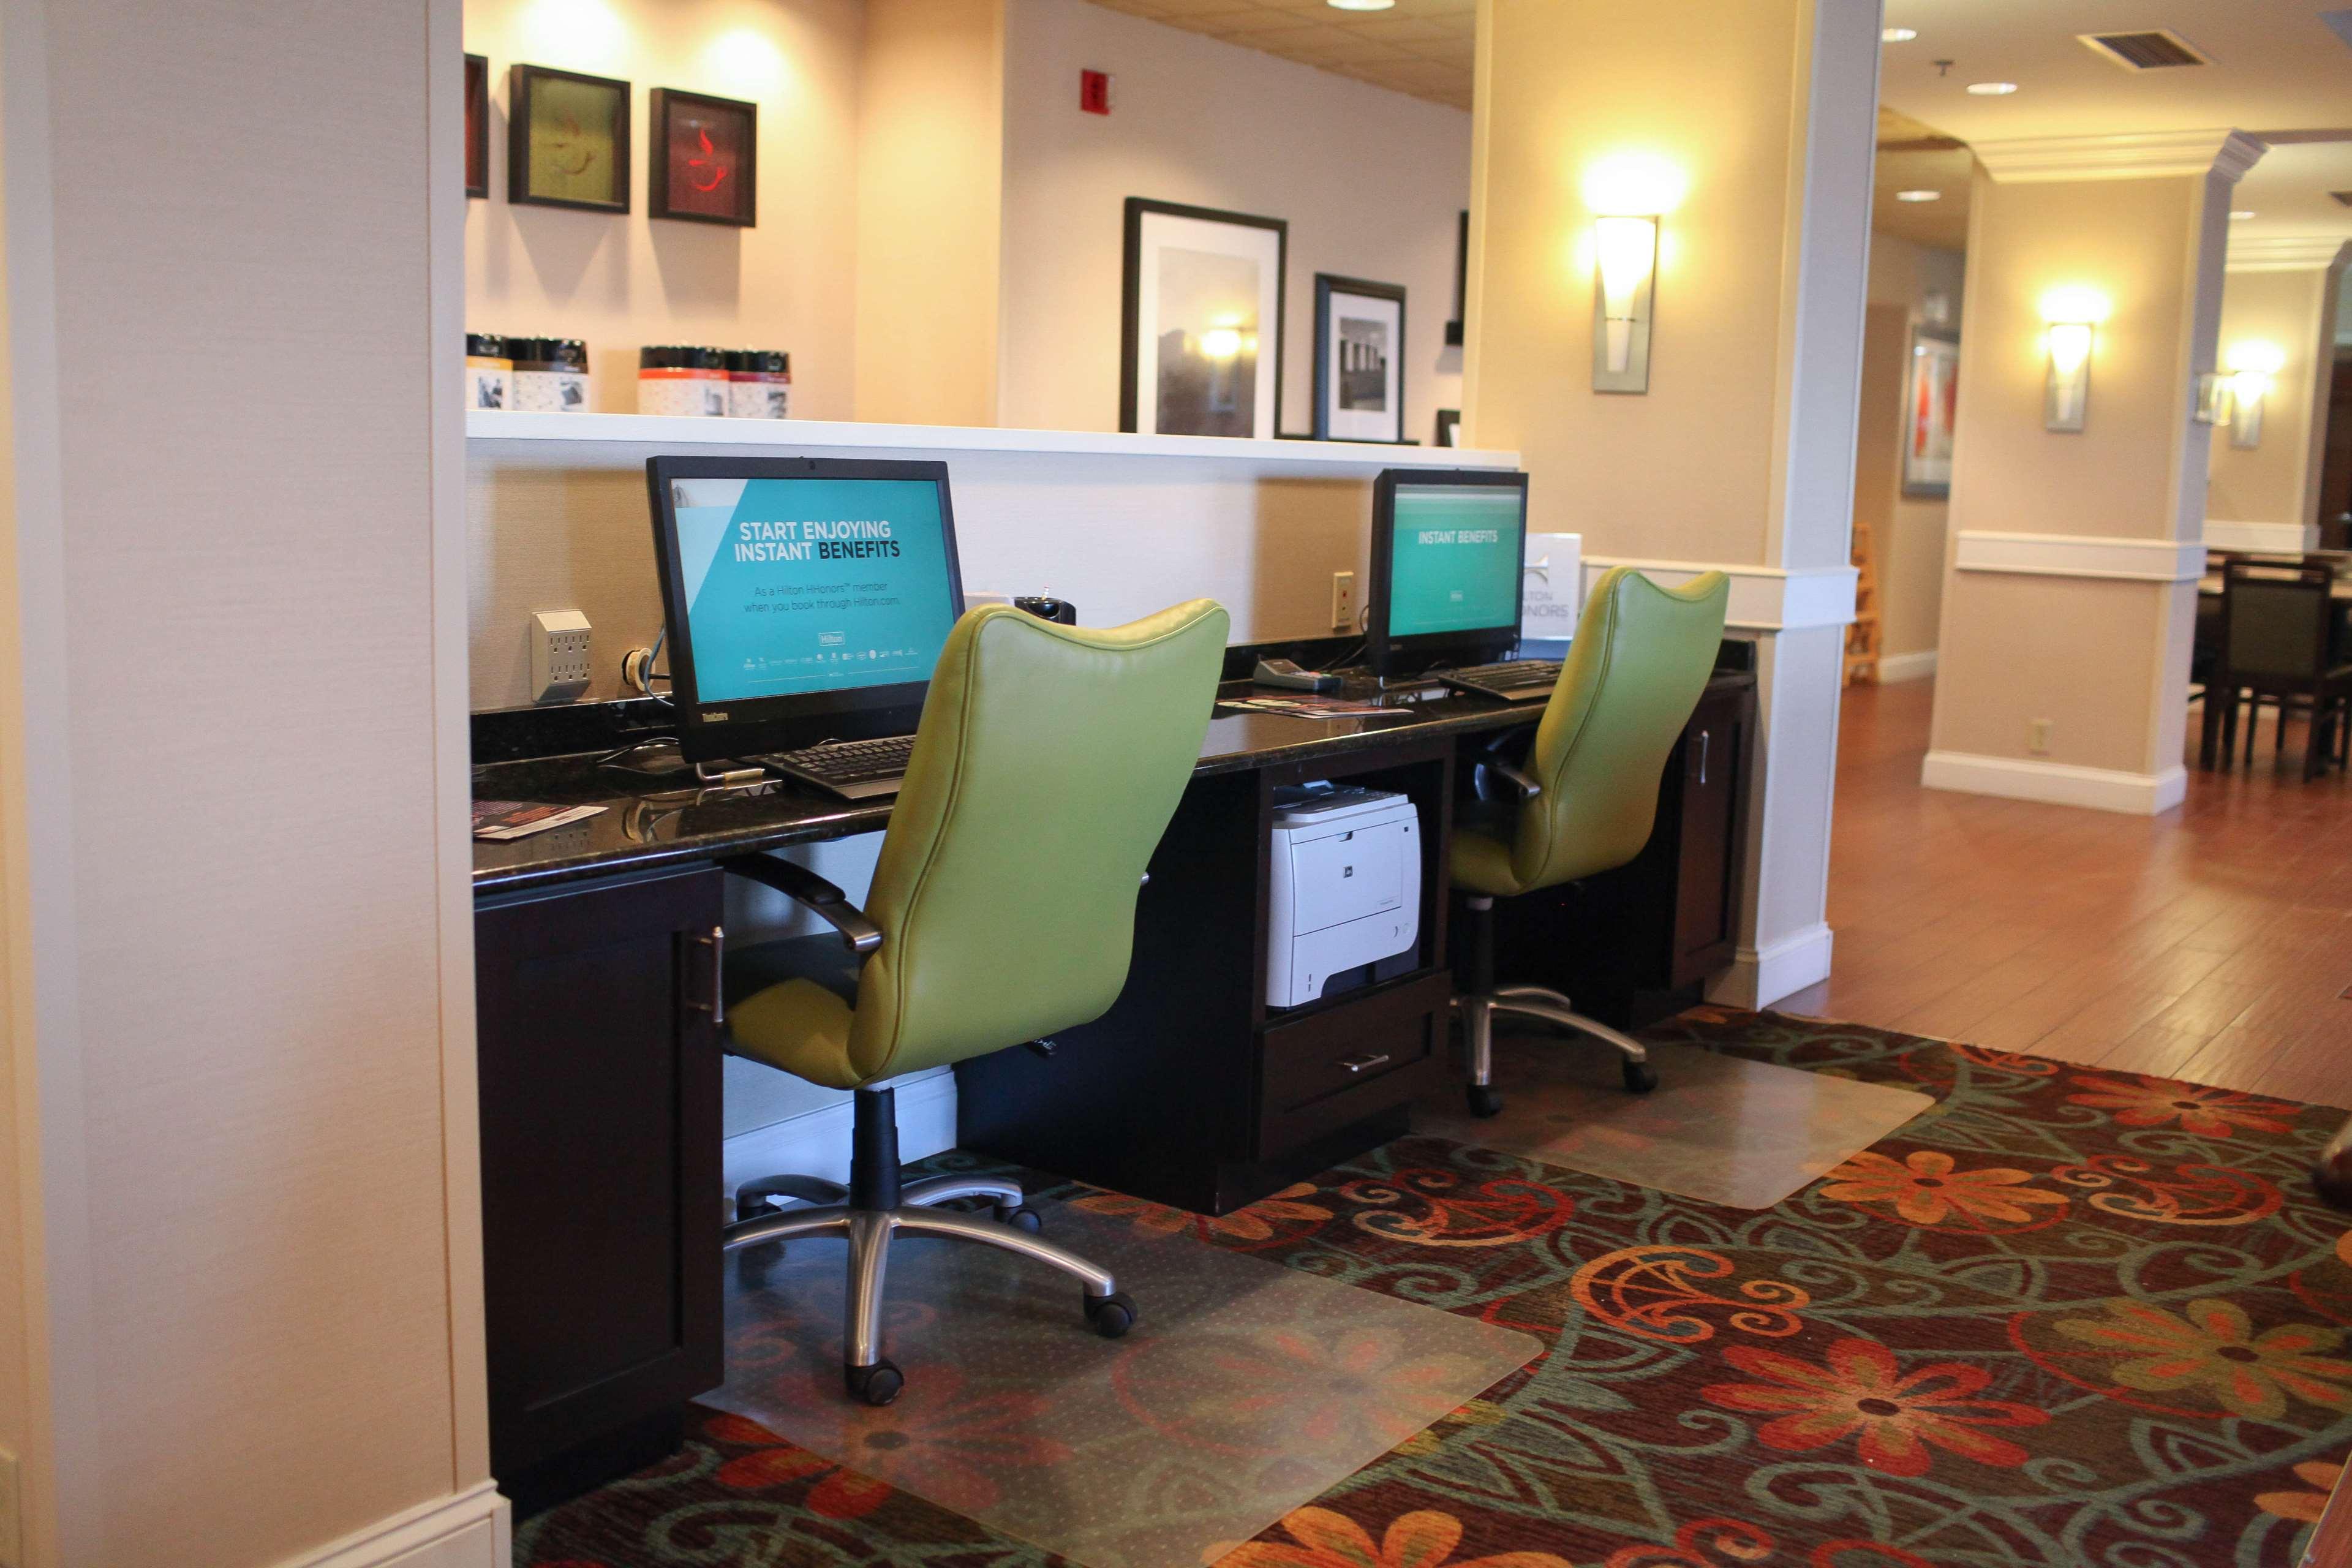 Hotel in IN Princeton 47670 Hampton Inn Princeton 107 S Richland Creek Drive  (812)385-2400